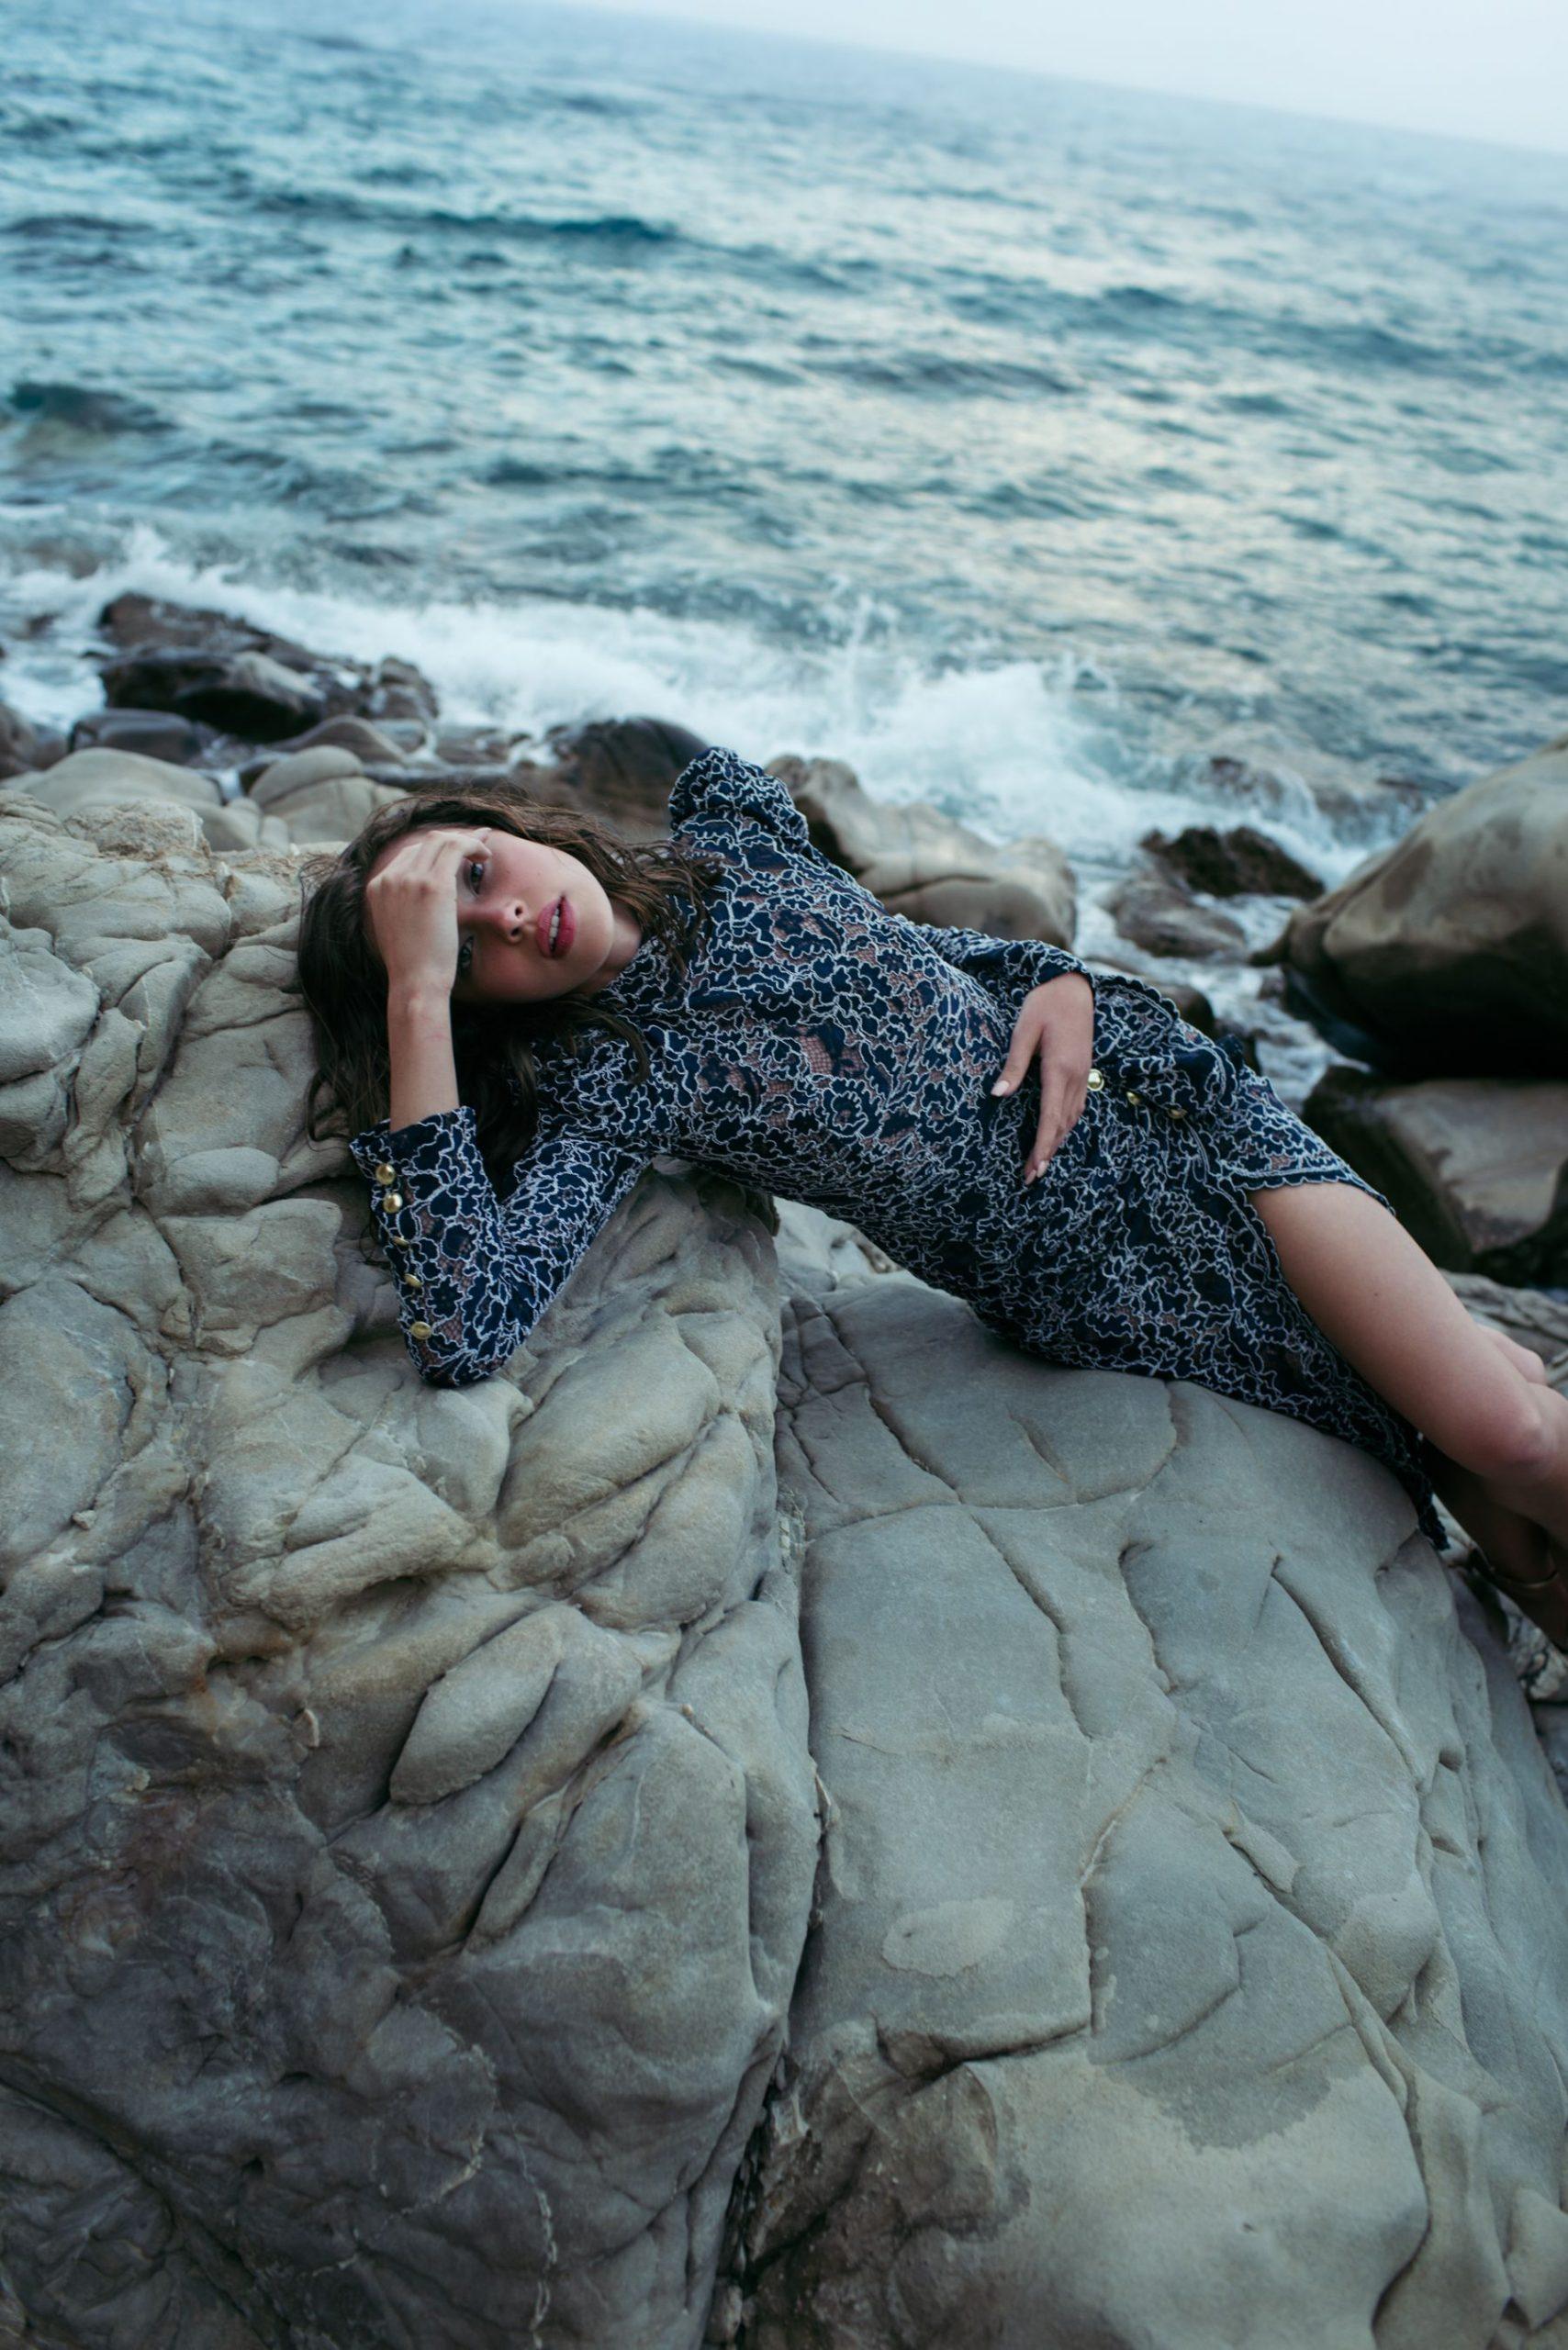 Ljepota, hirovitost i šarm mora u novoj modnoj priči dvojca eNVy room